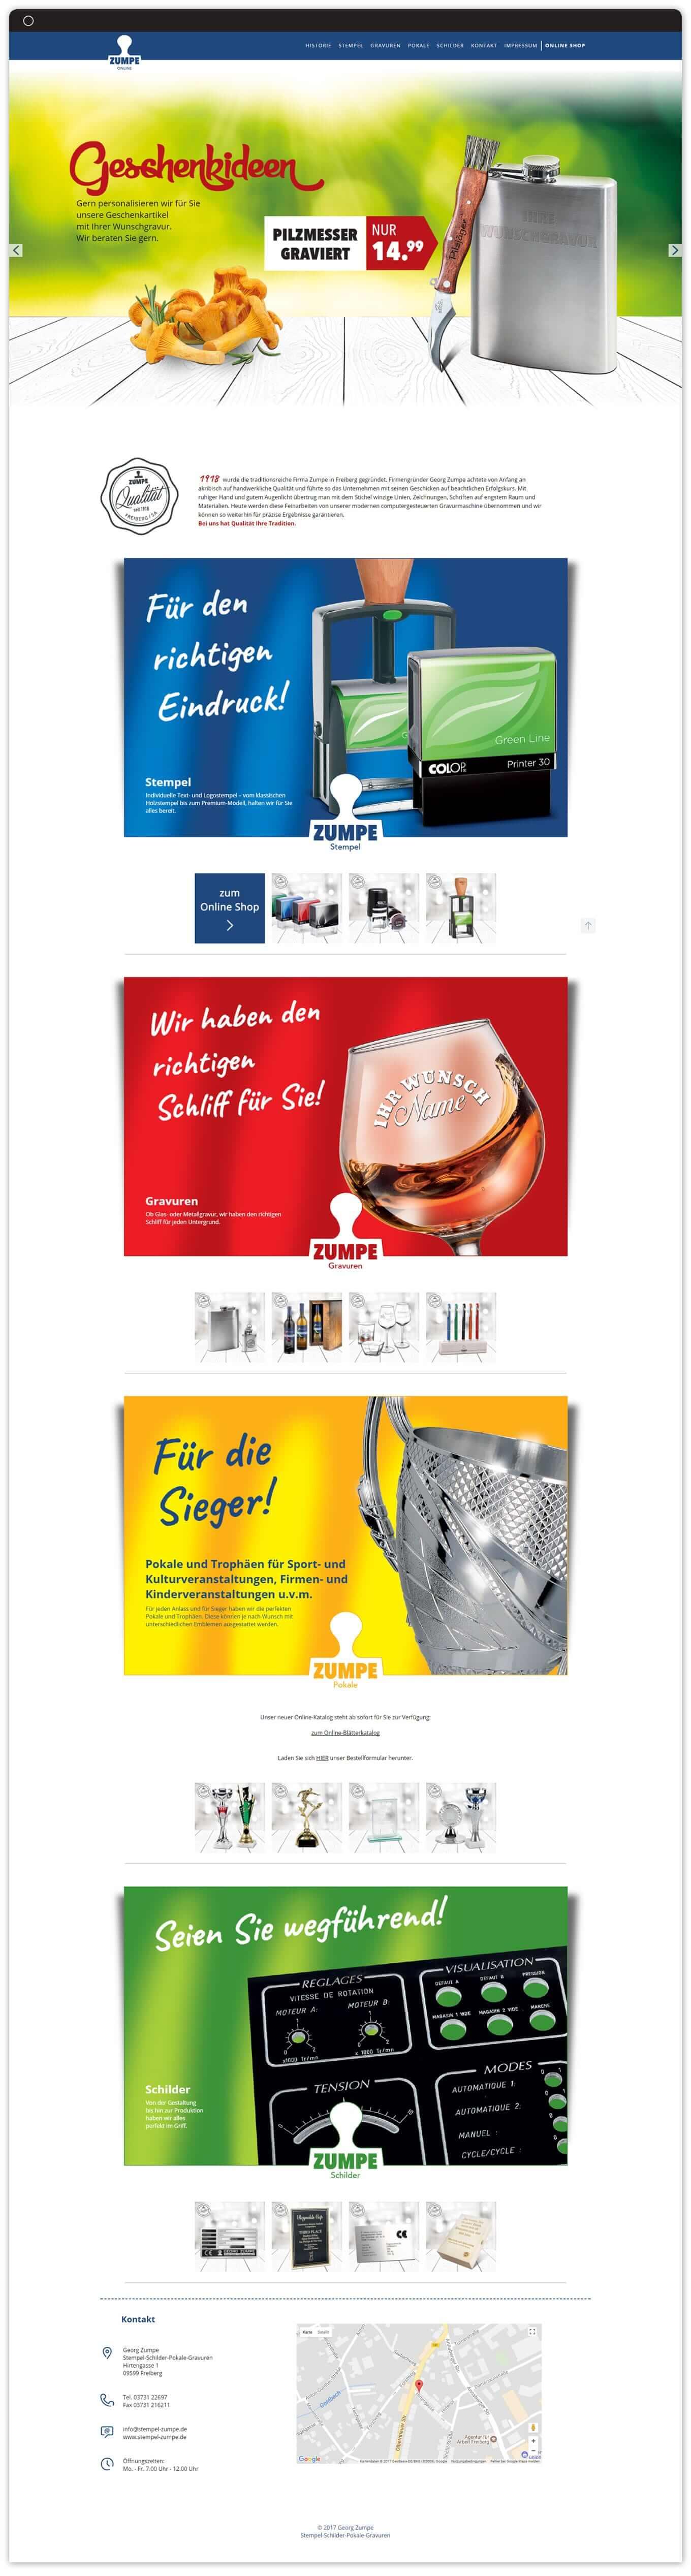 Zumpe Freiberg Website - Referenz Maho Werbeagentur Dresden